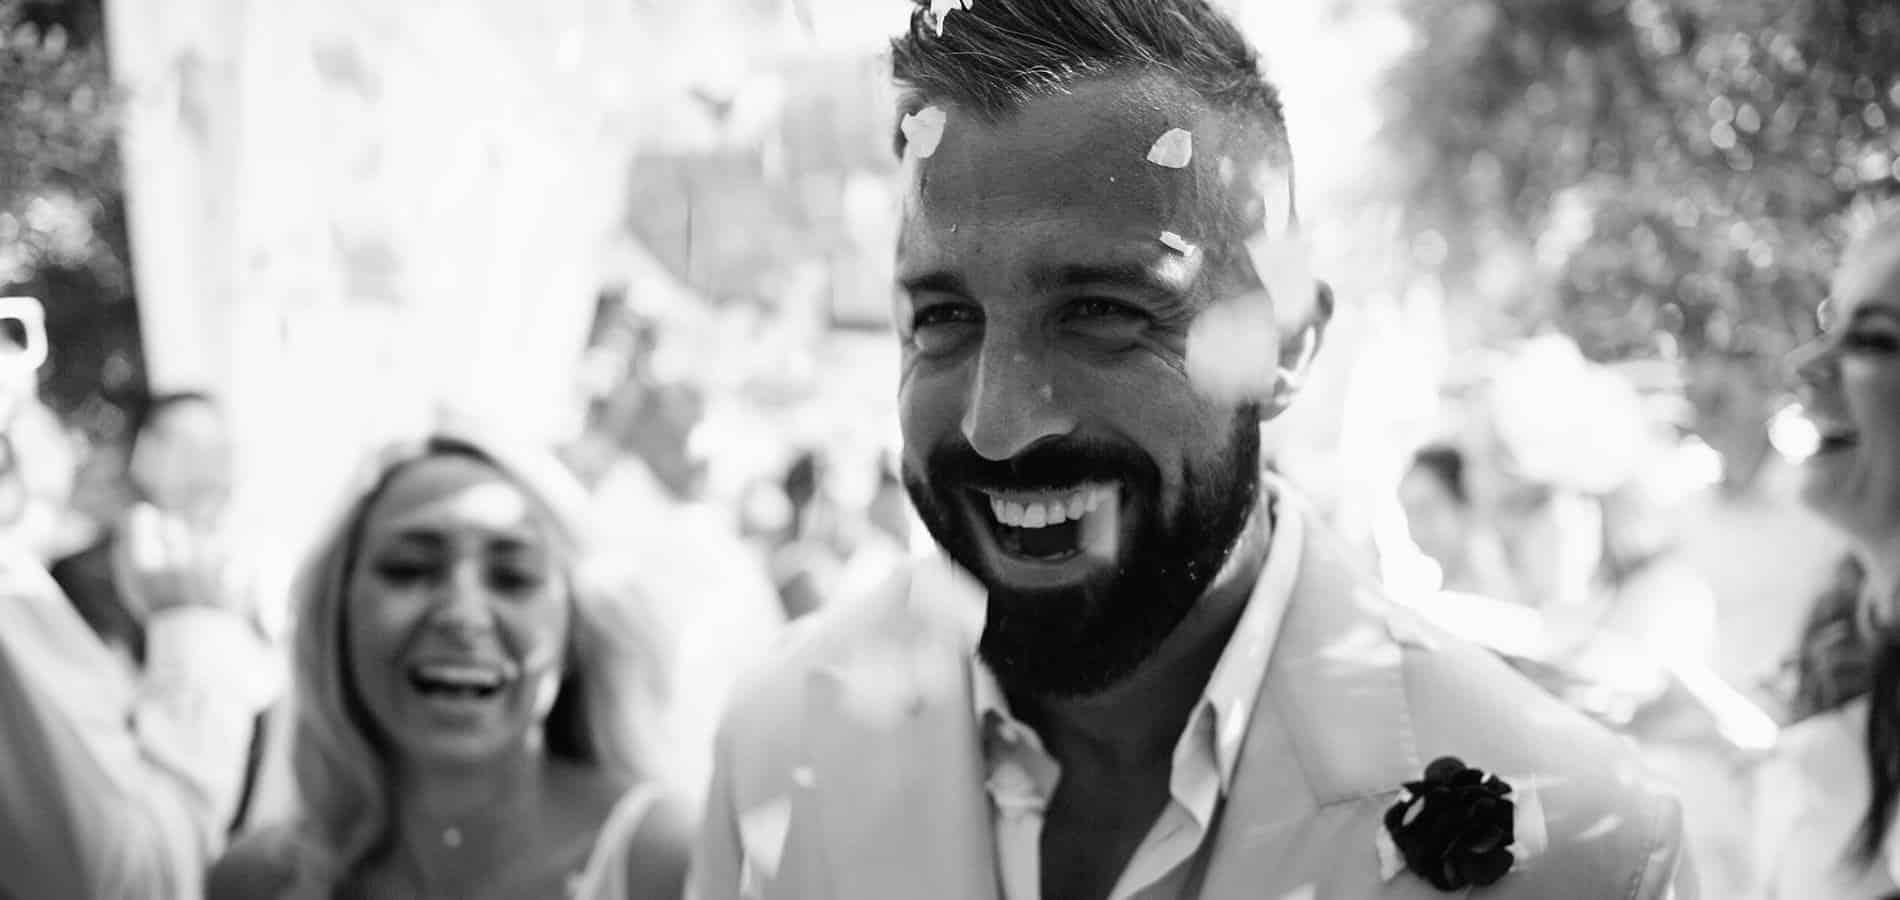 bride-groom-wedding-confetti-marrkech